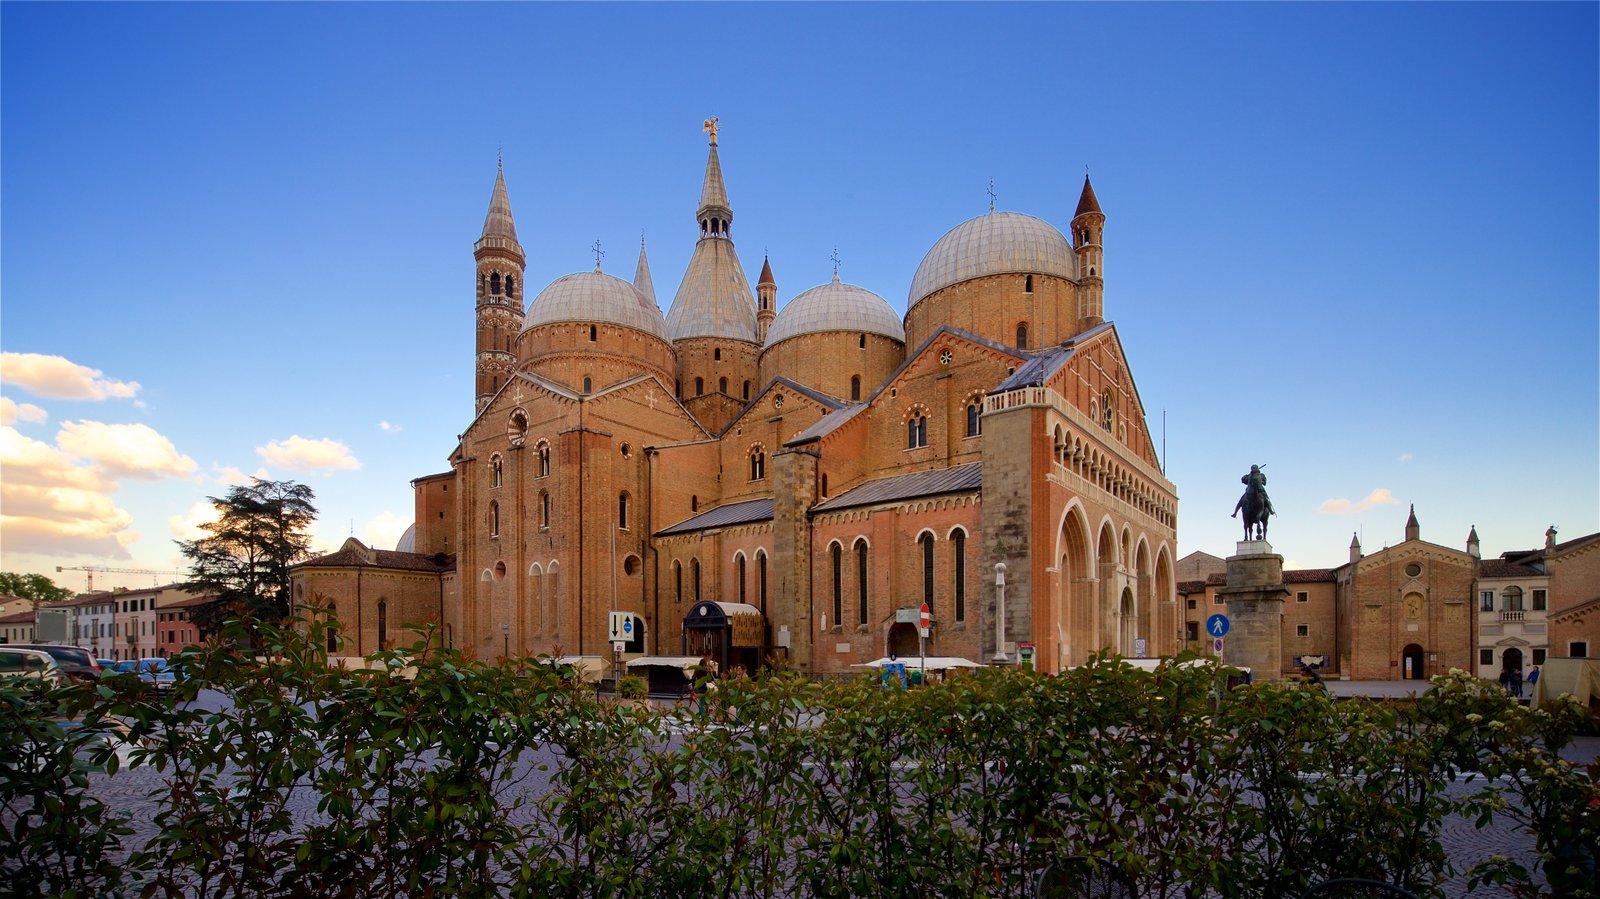 Basilica di Sant\'Antonio da Padova featuring a sunset, a church or cathedral and heritage architecture